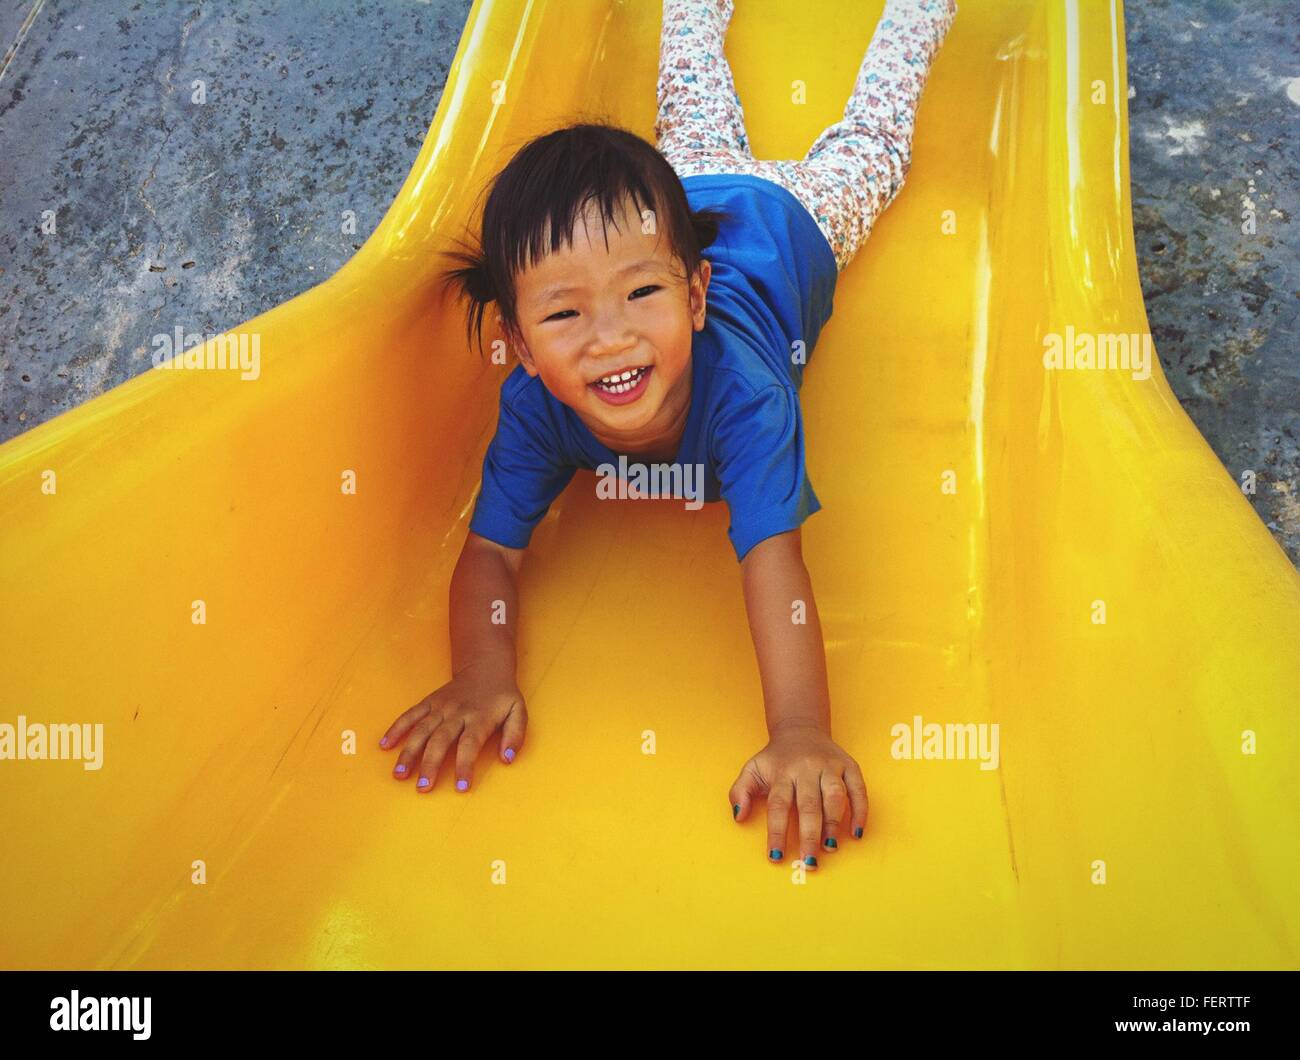 Retrato de niña feliz jugando en Amarillo Diapositiva En Playground Imagen De Stock